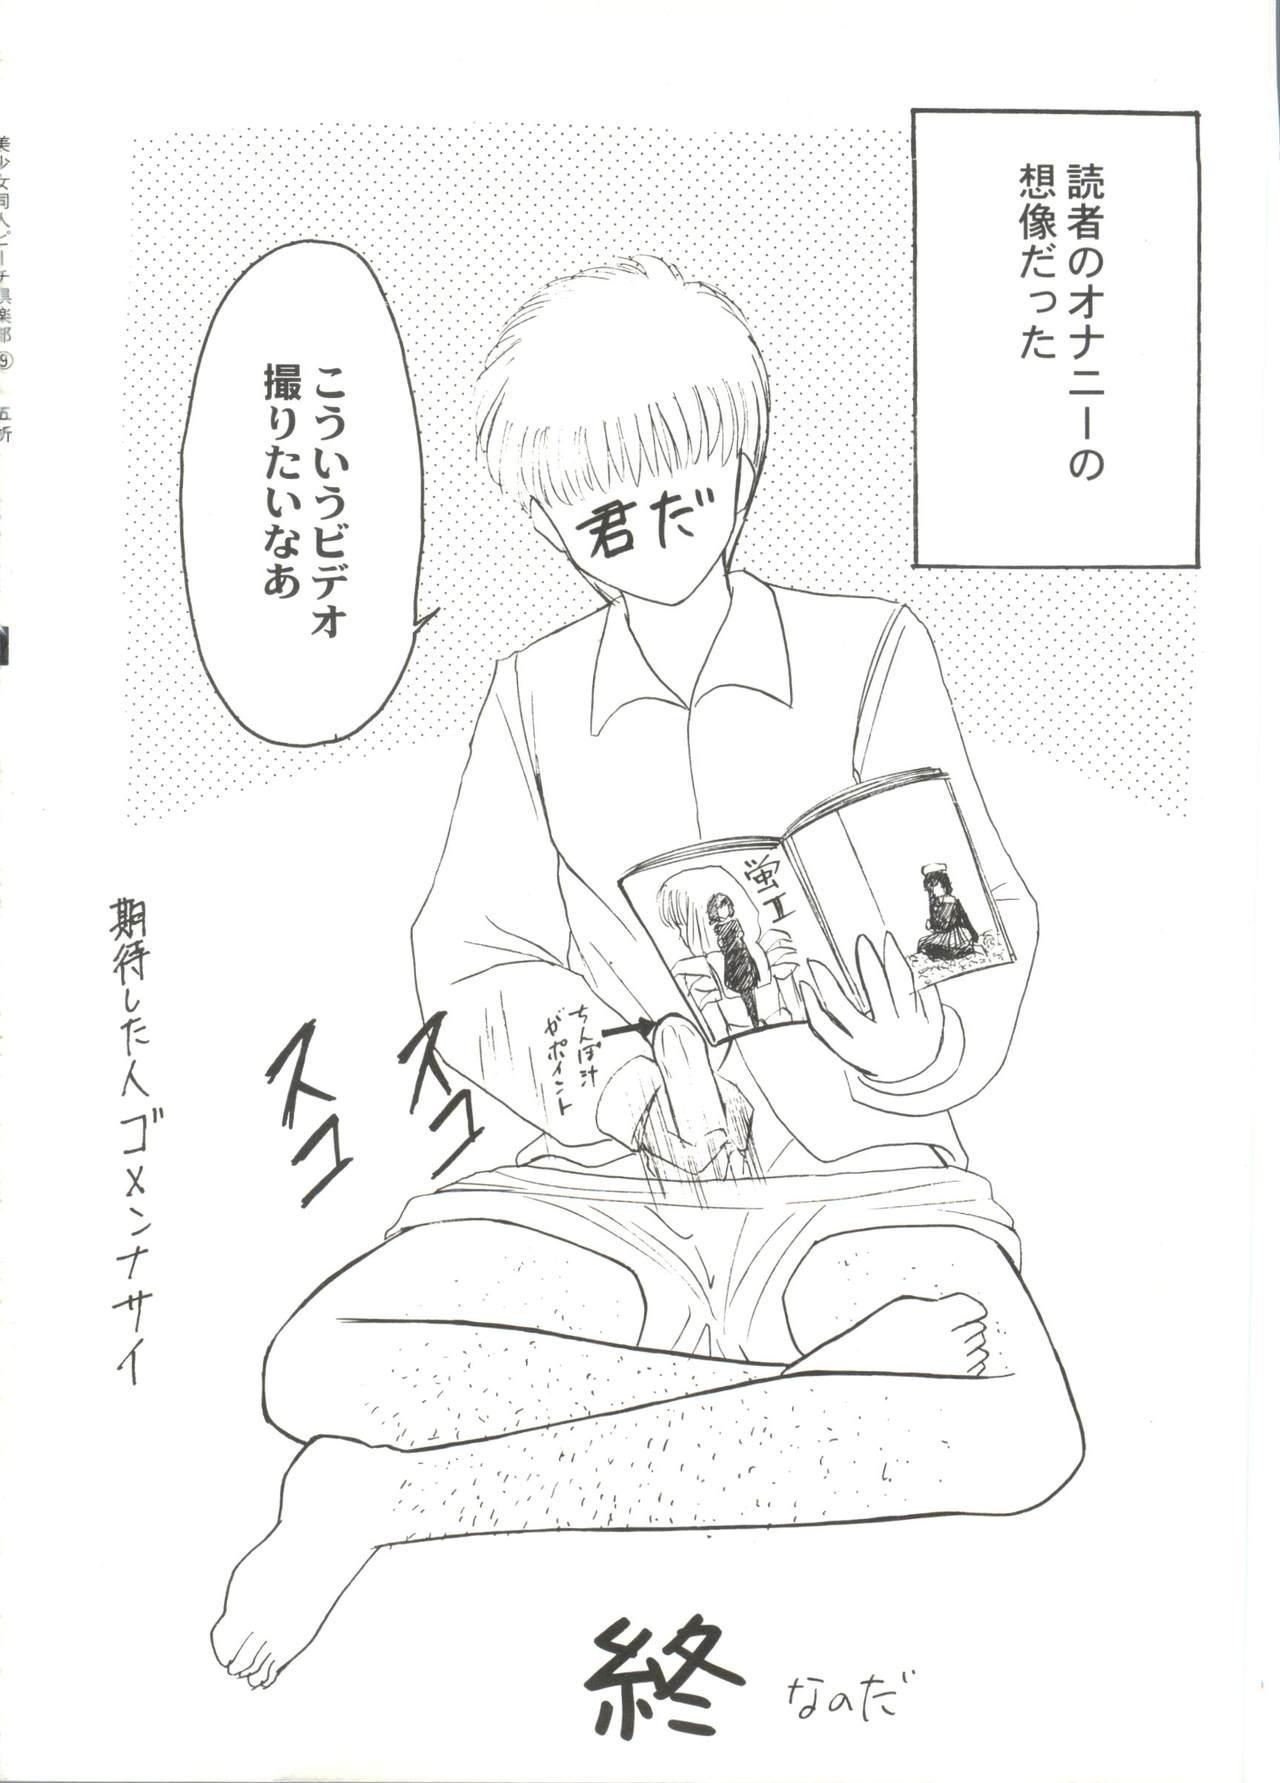 Bishoujo Doujin Peach Club - Pretty Gal's Fanzine Peach Club 9 81